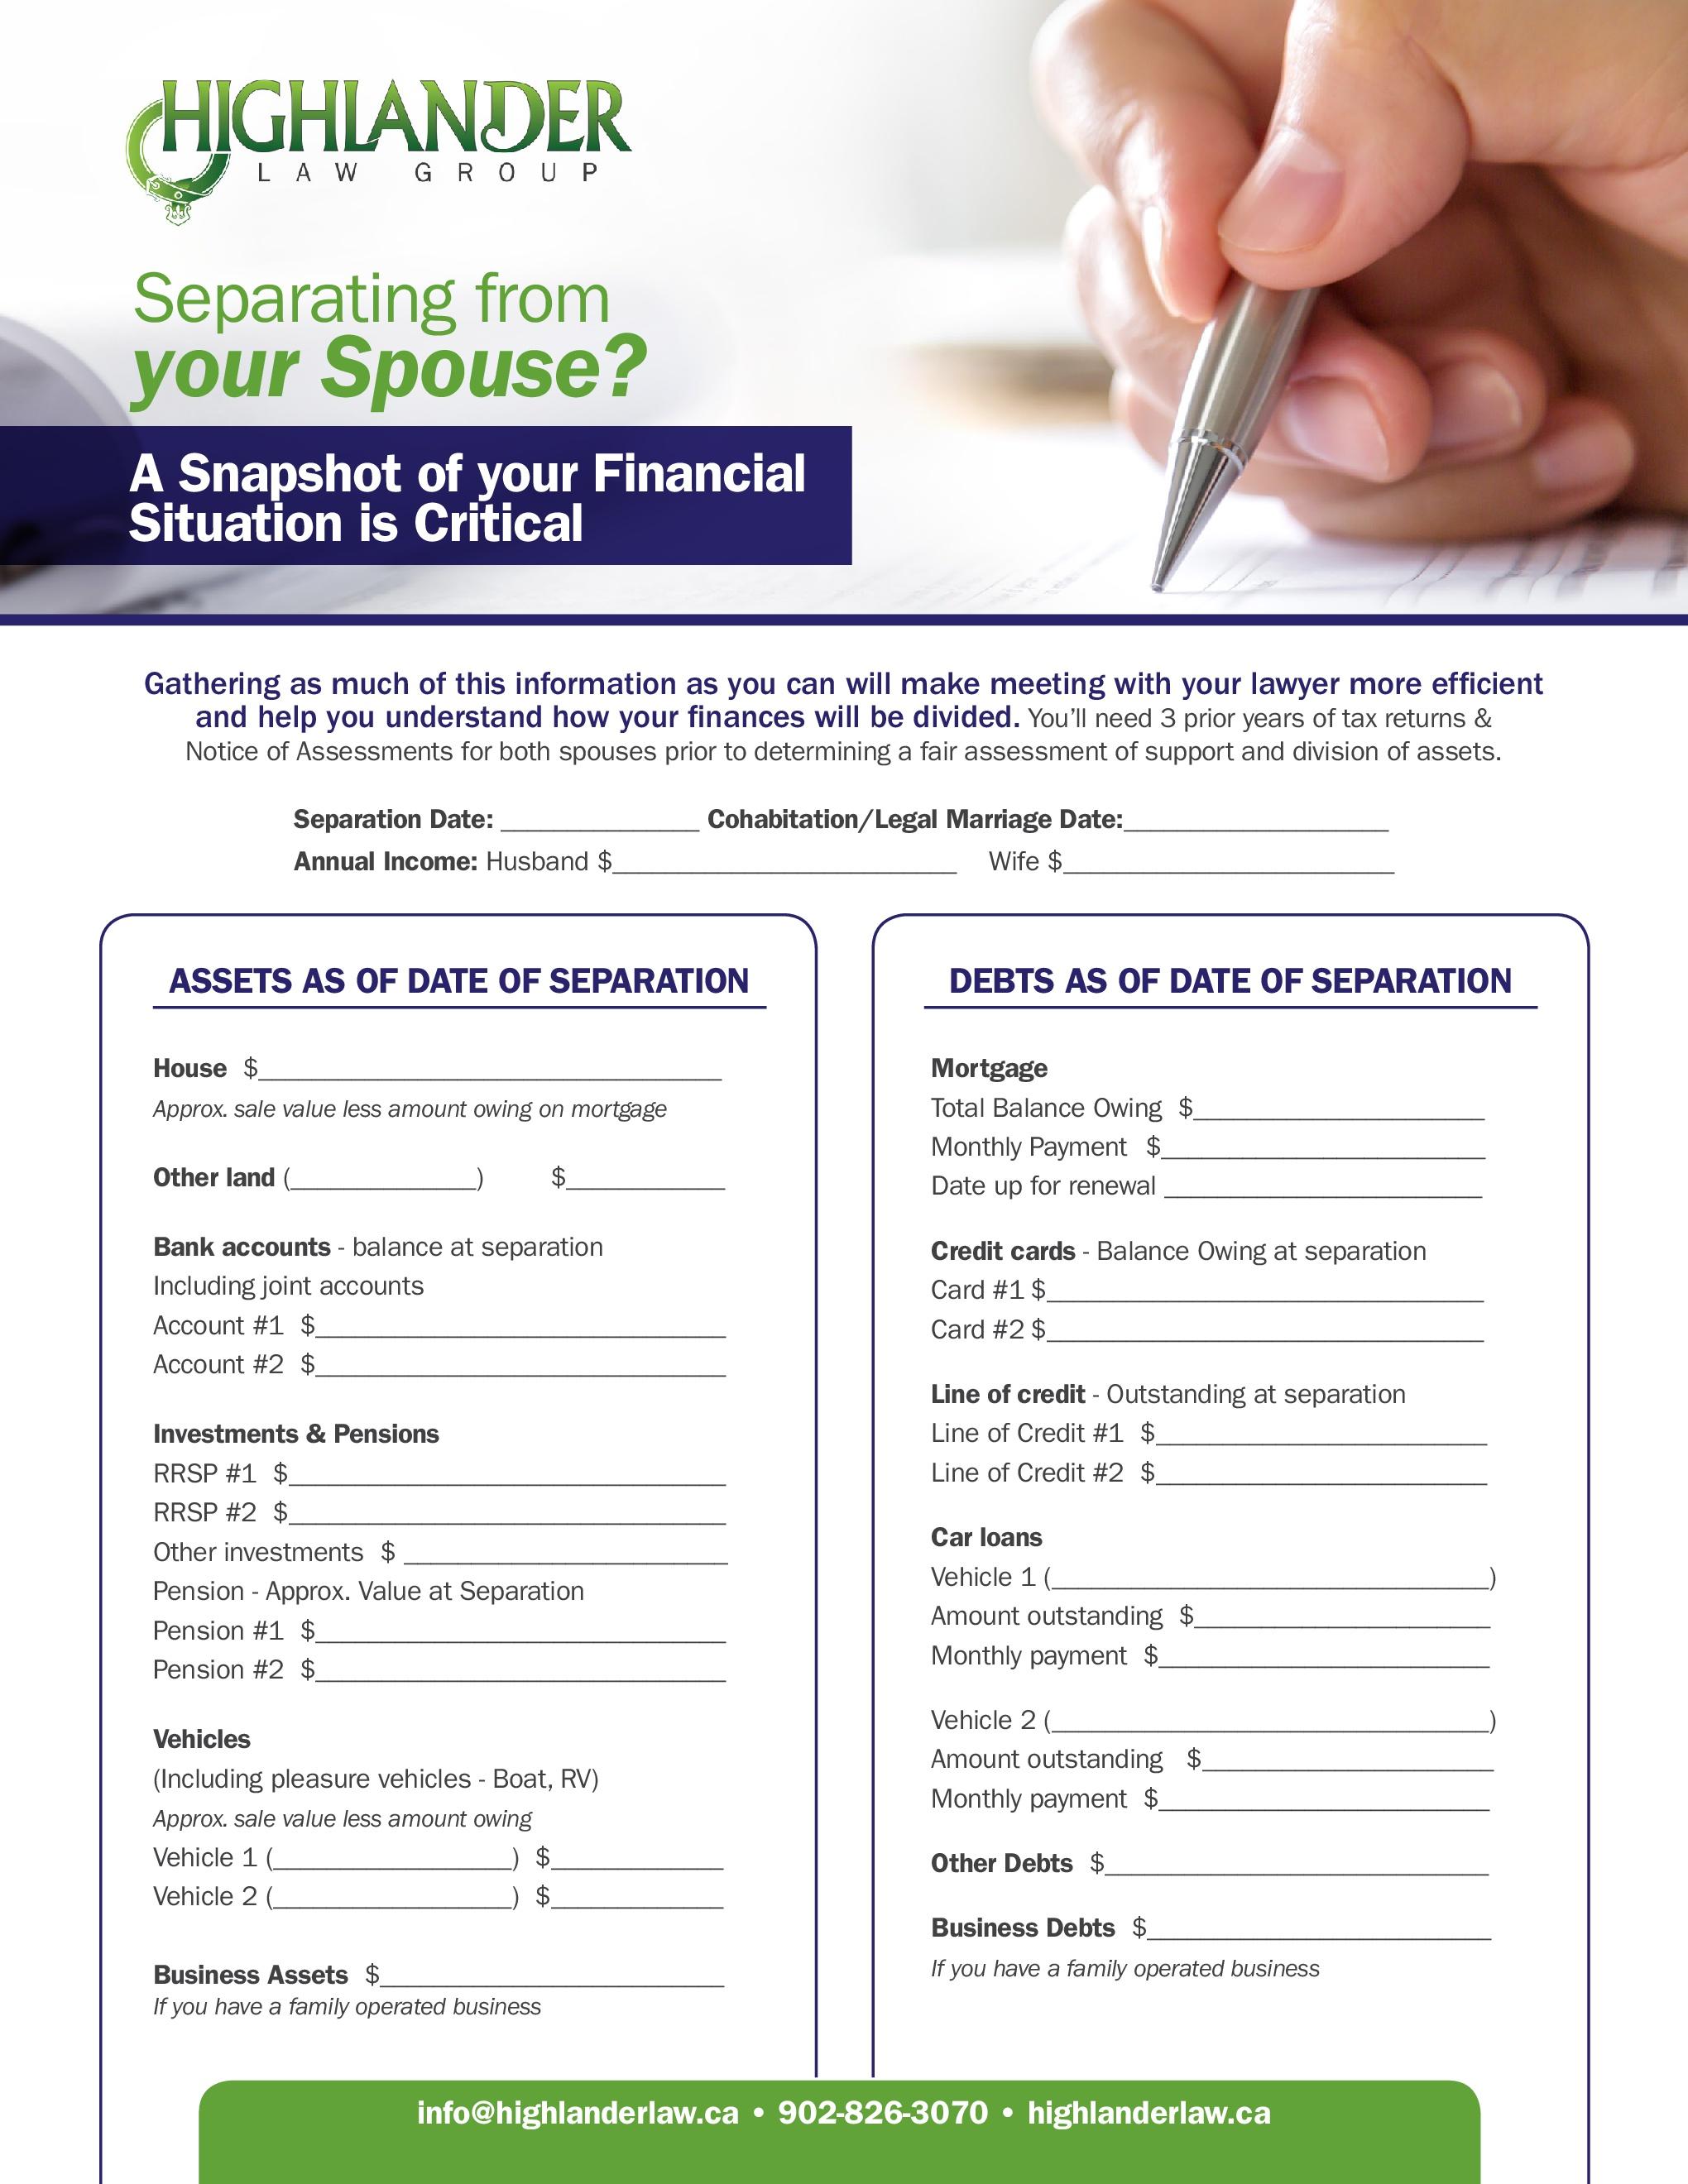 Financial Snapshot checklist preparing to divorce or separate